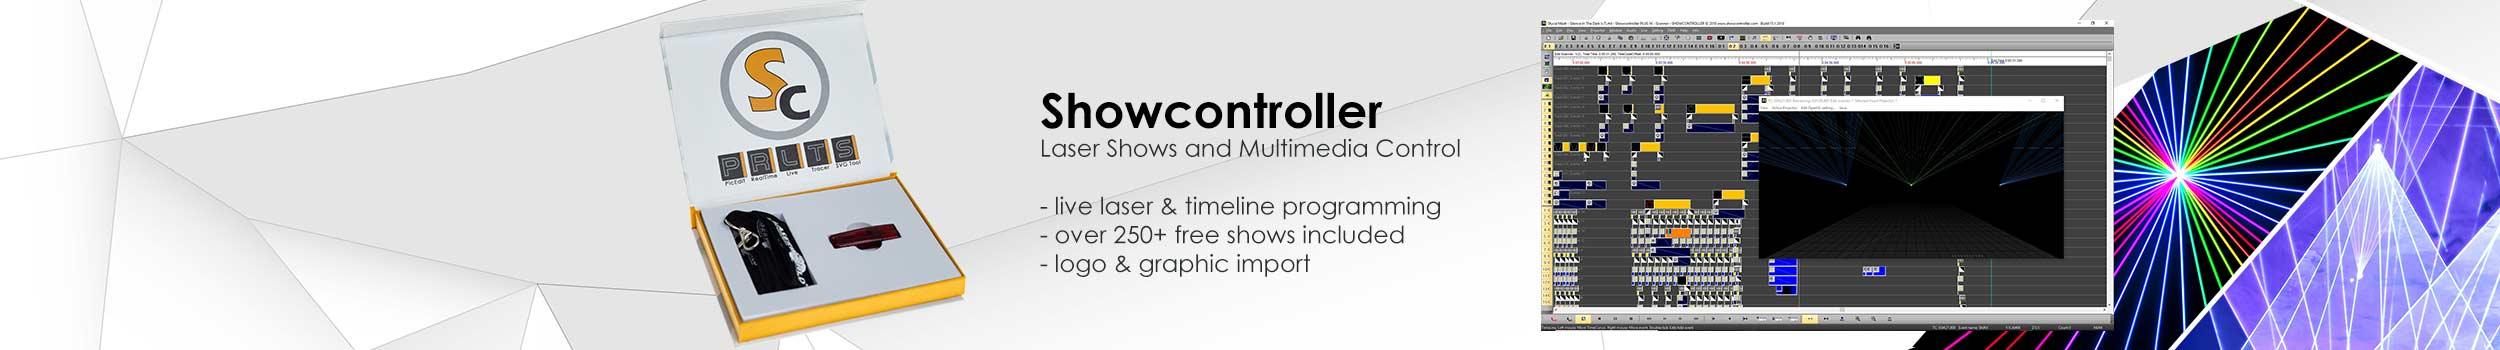 2019_laserworld_header_350px_Showcontroller_desktop_en.jpg